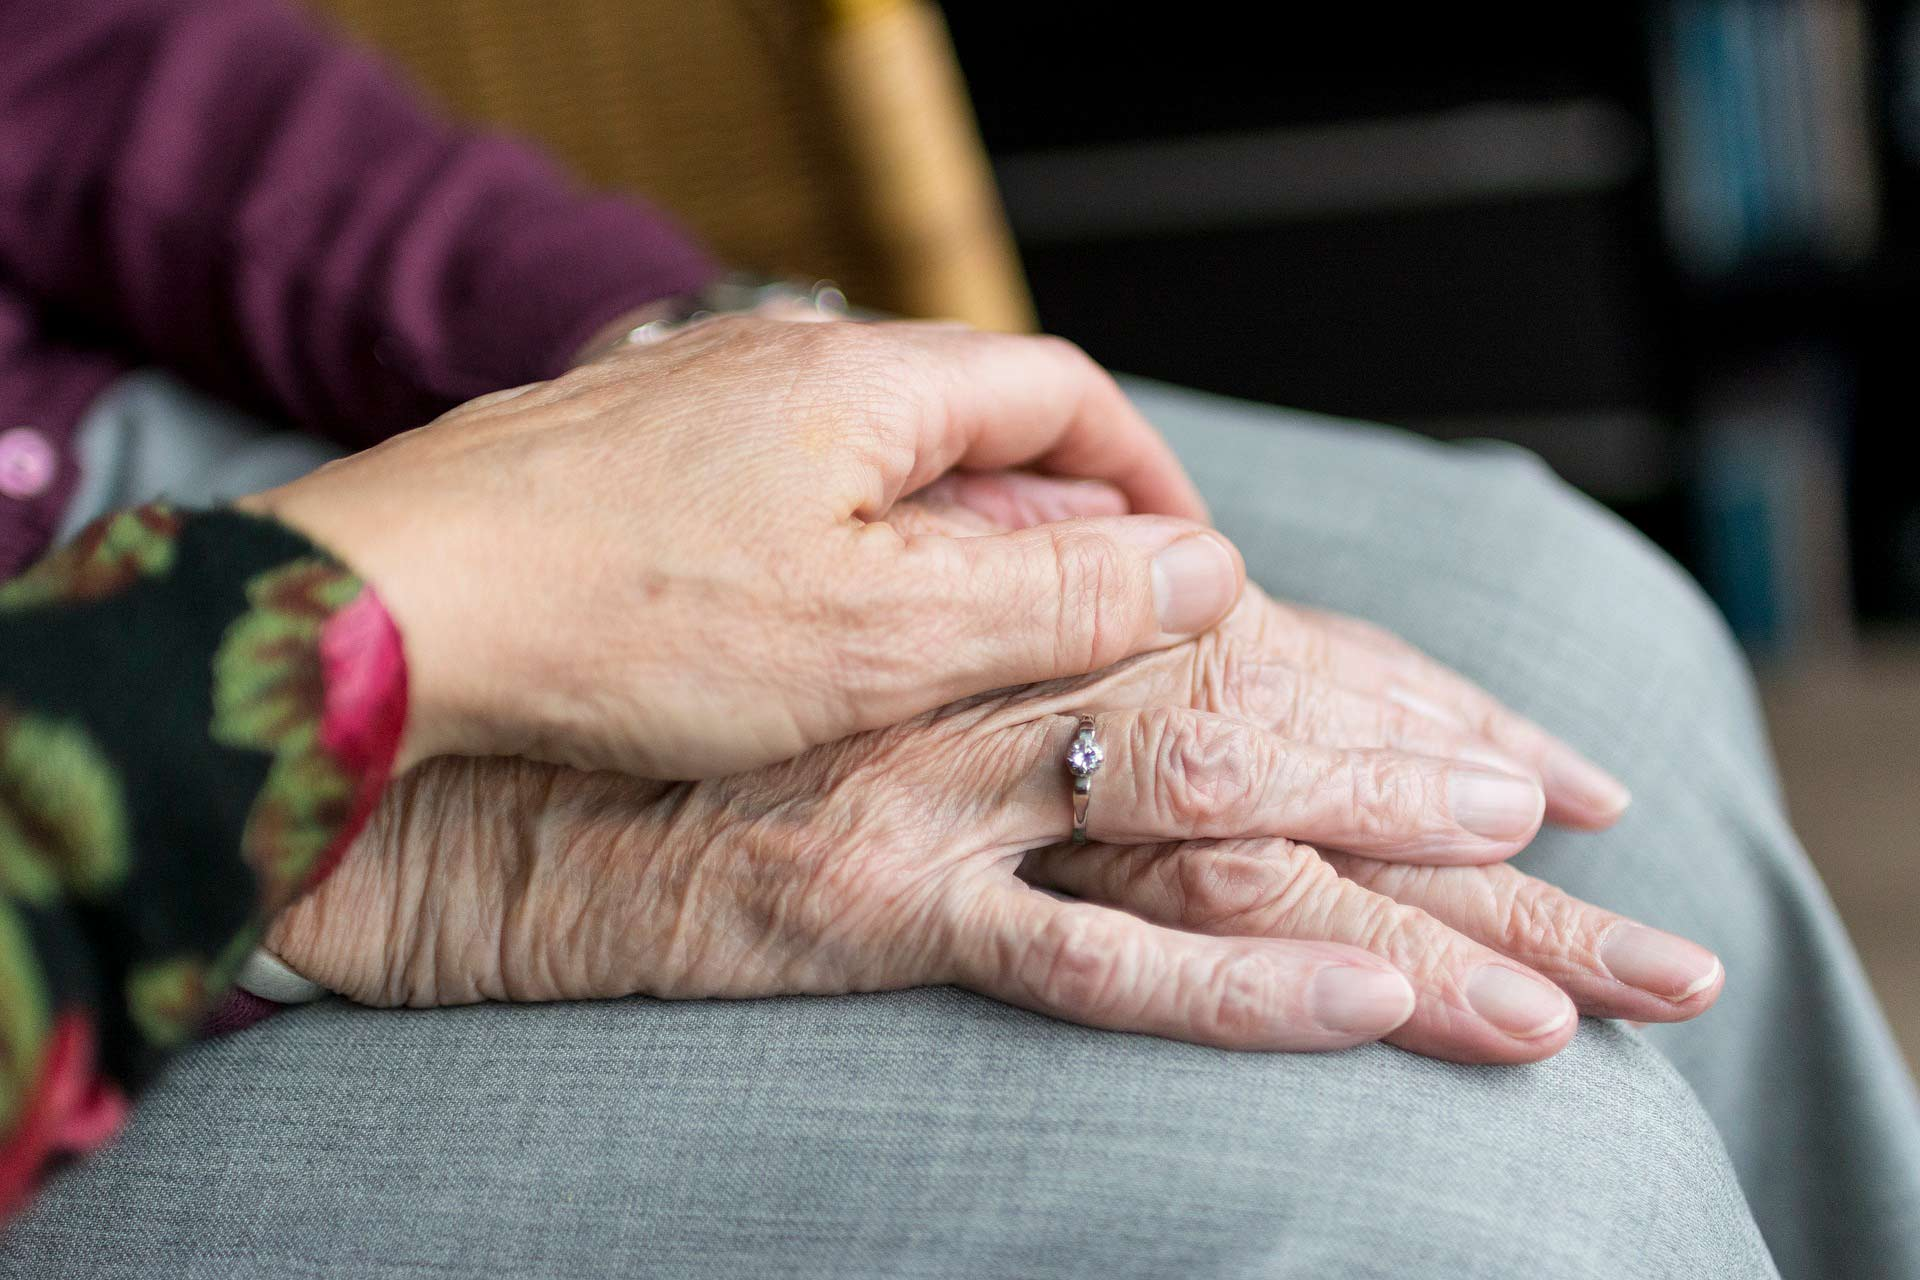 Assistenza anziani | Servizio badanti